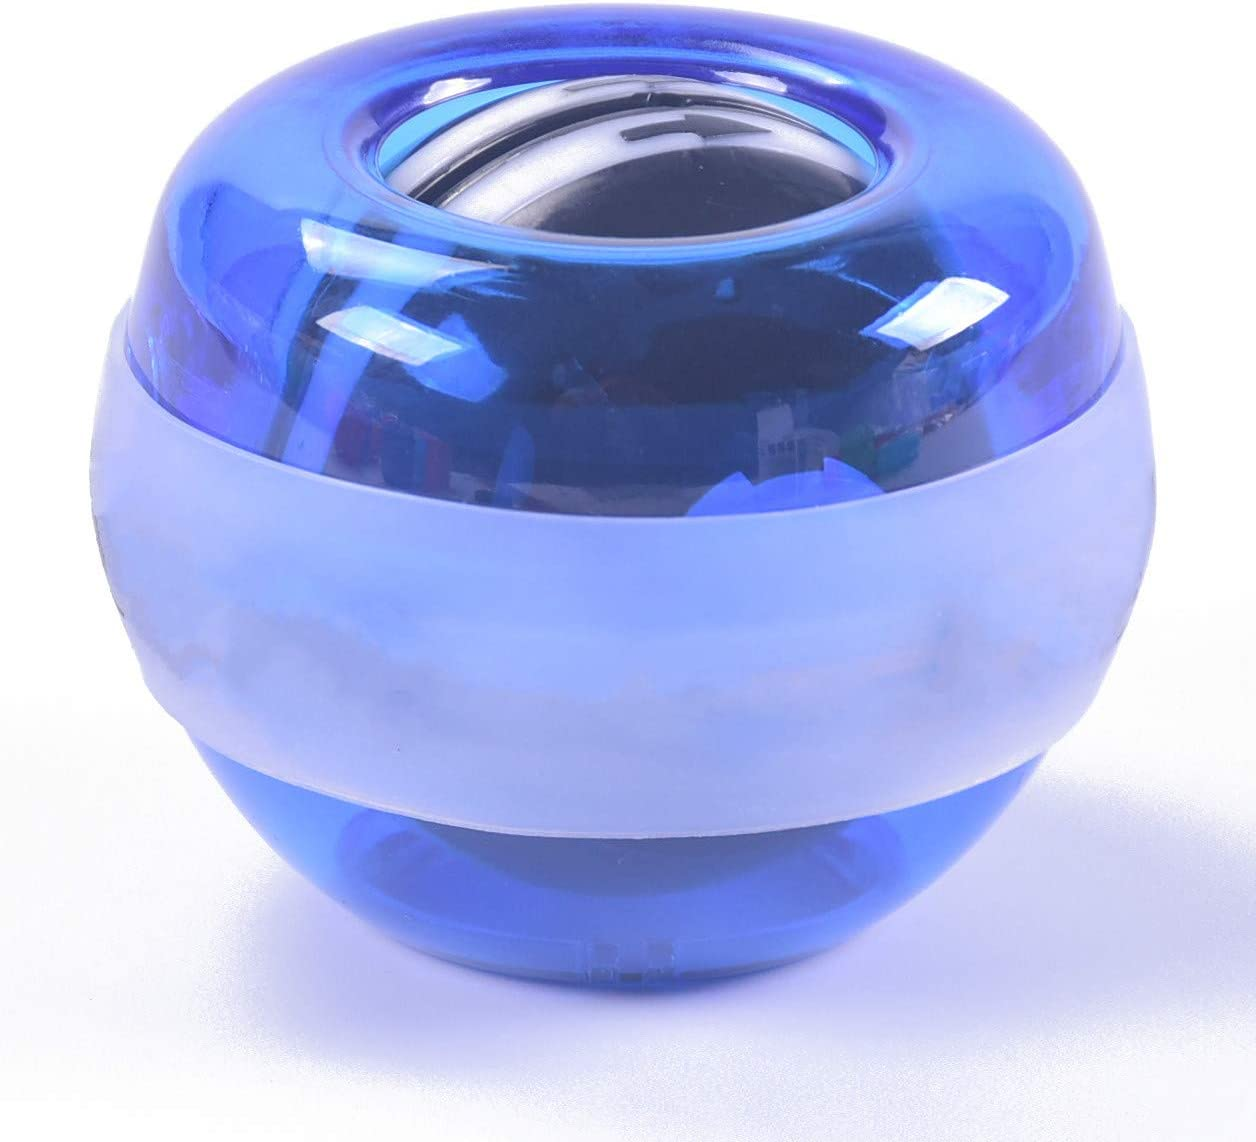 Tangminyidi Power Gyroscopic Ball,Auto-comenzando mu/ñeca Bola de mu/ñeca Fuerza de mu/ñeca Bola de Gravedad Bola de la mu/ñeca Dedo de la Fuerza de la Bola girosfera